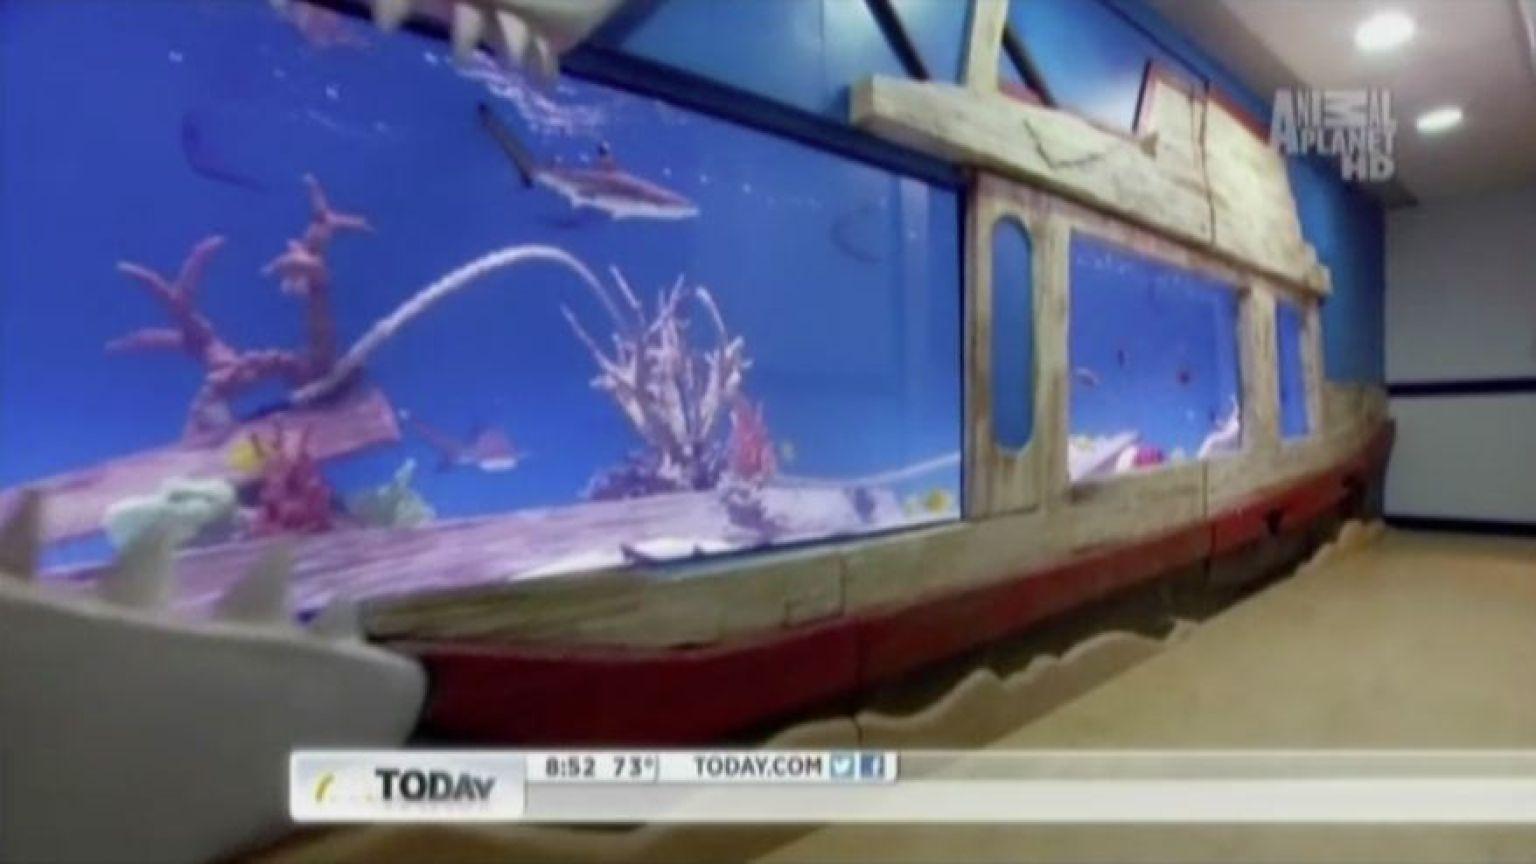 Tanked fish tanks tracy morgan for Tanked fish tanks